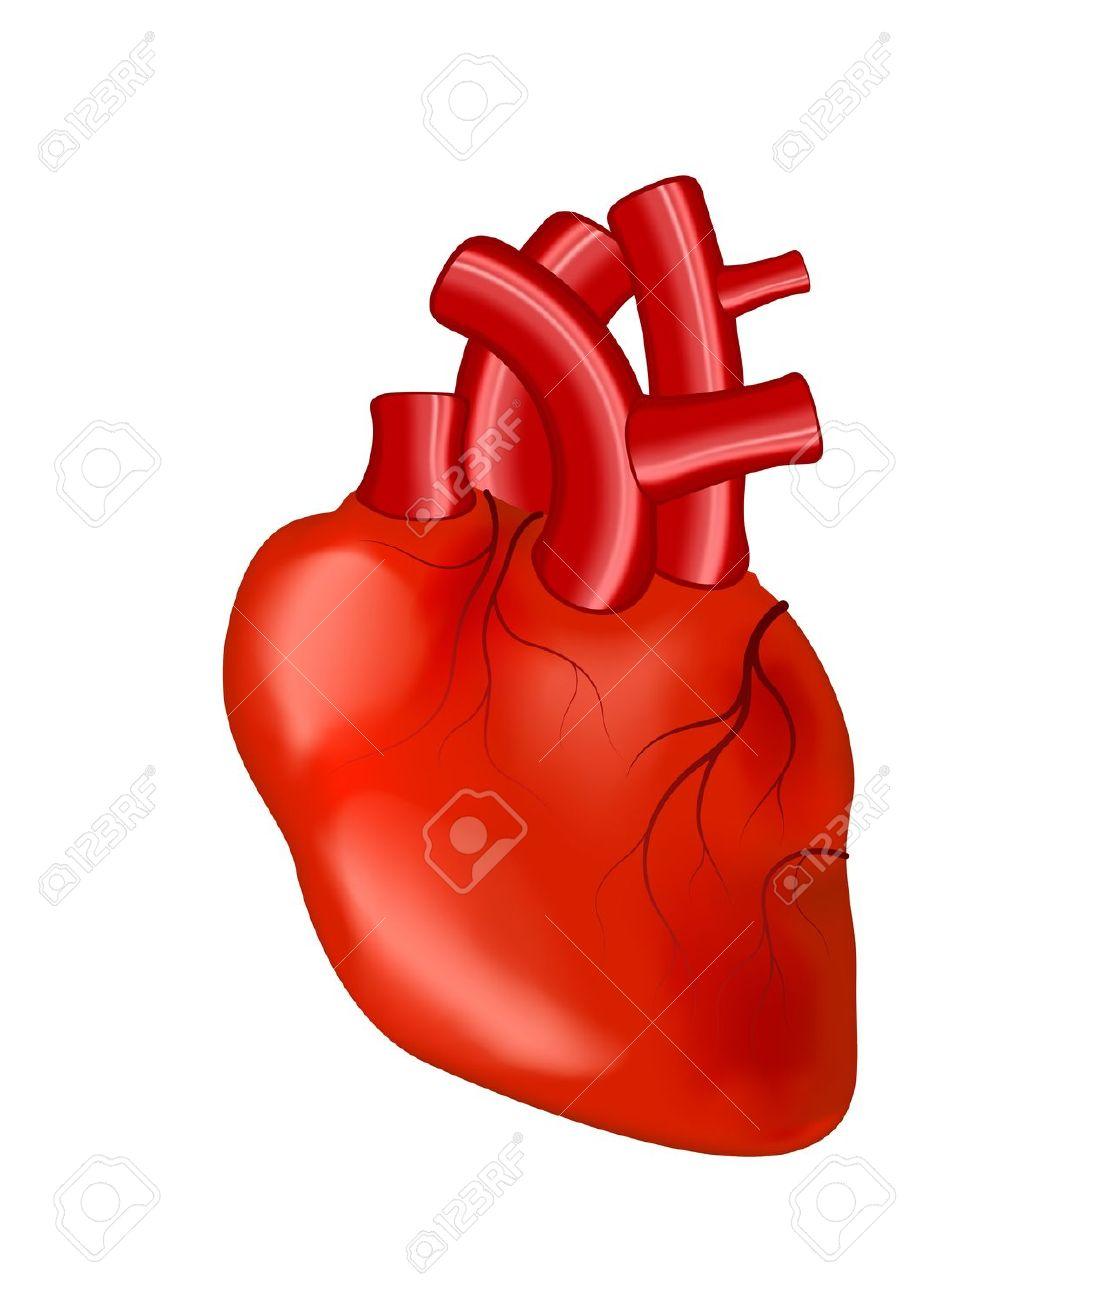 Human Heart Anatomy Cliparts .